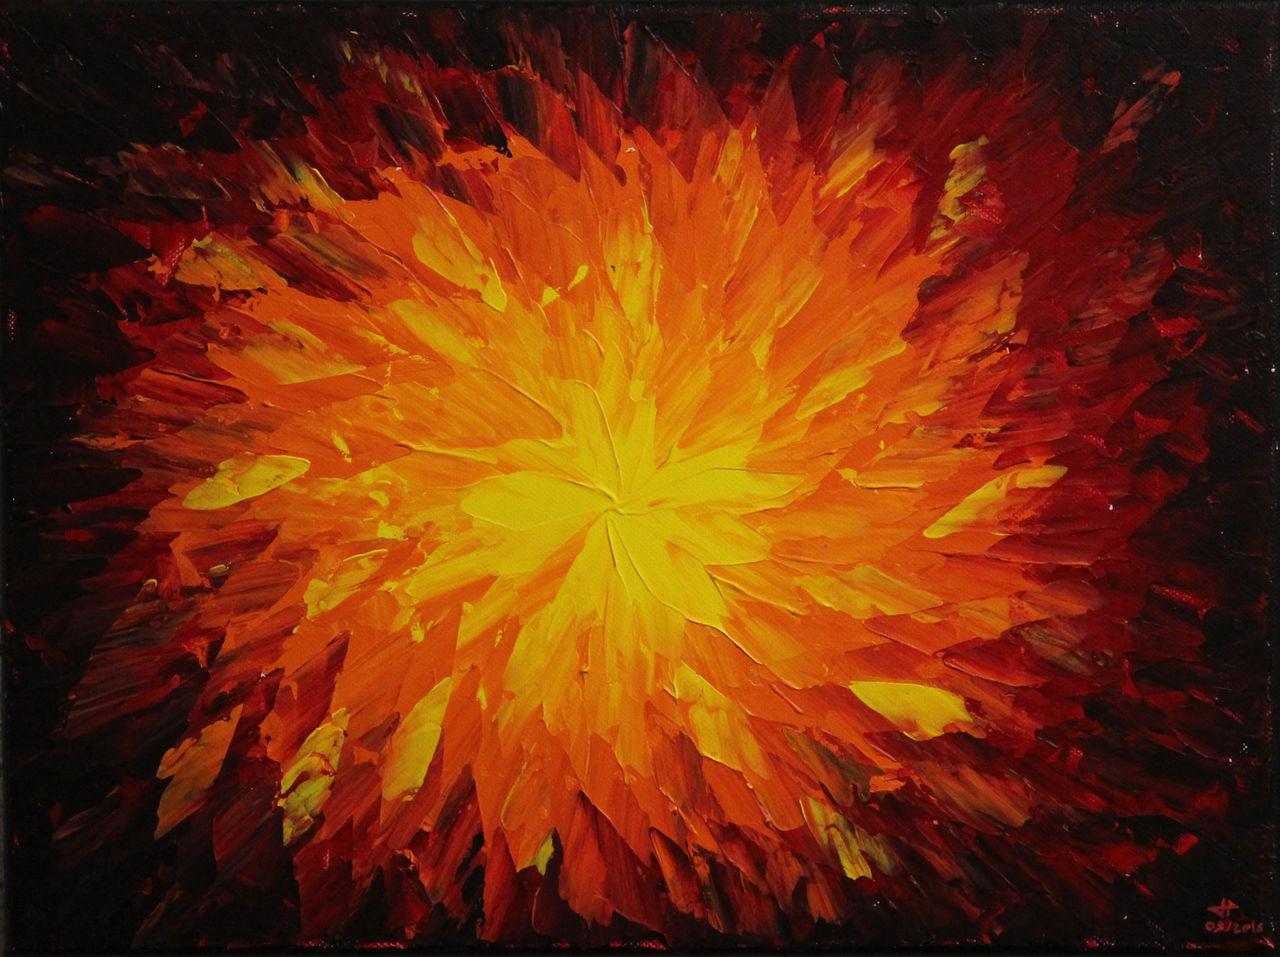 Jonathan-Pradillon Luminosité flamboyante